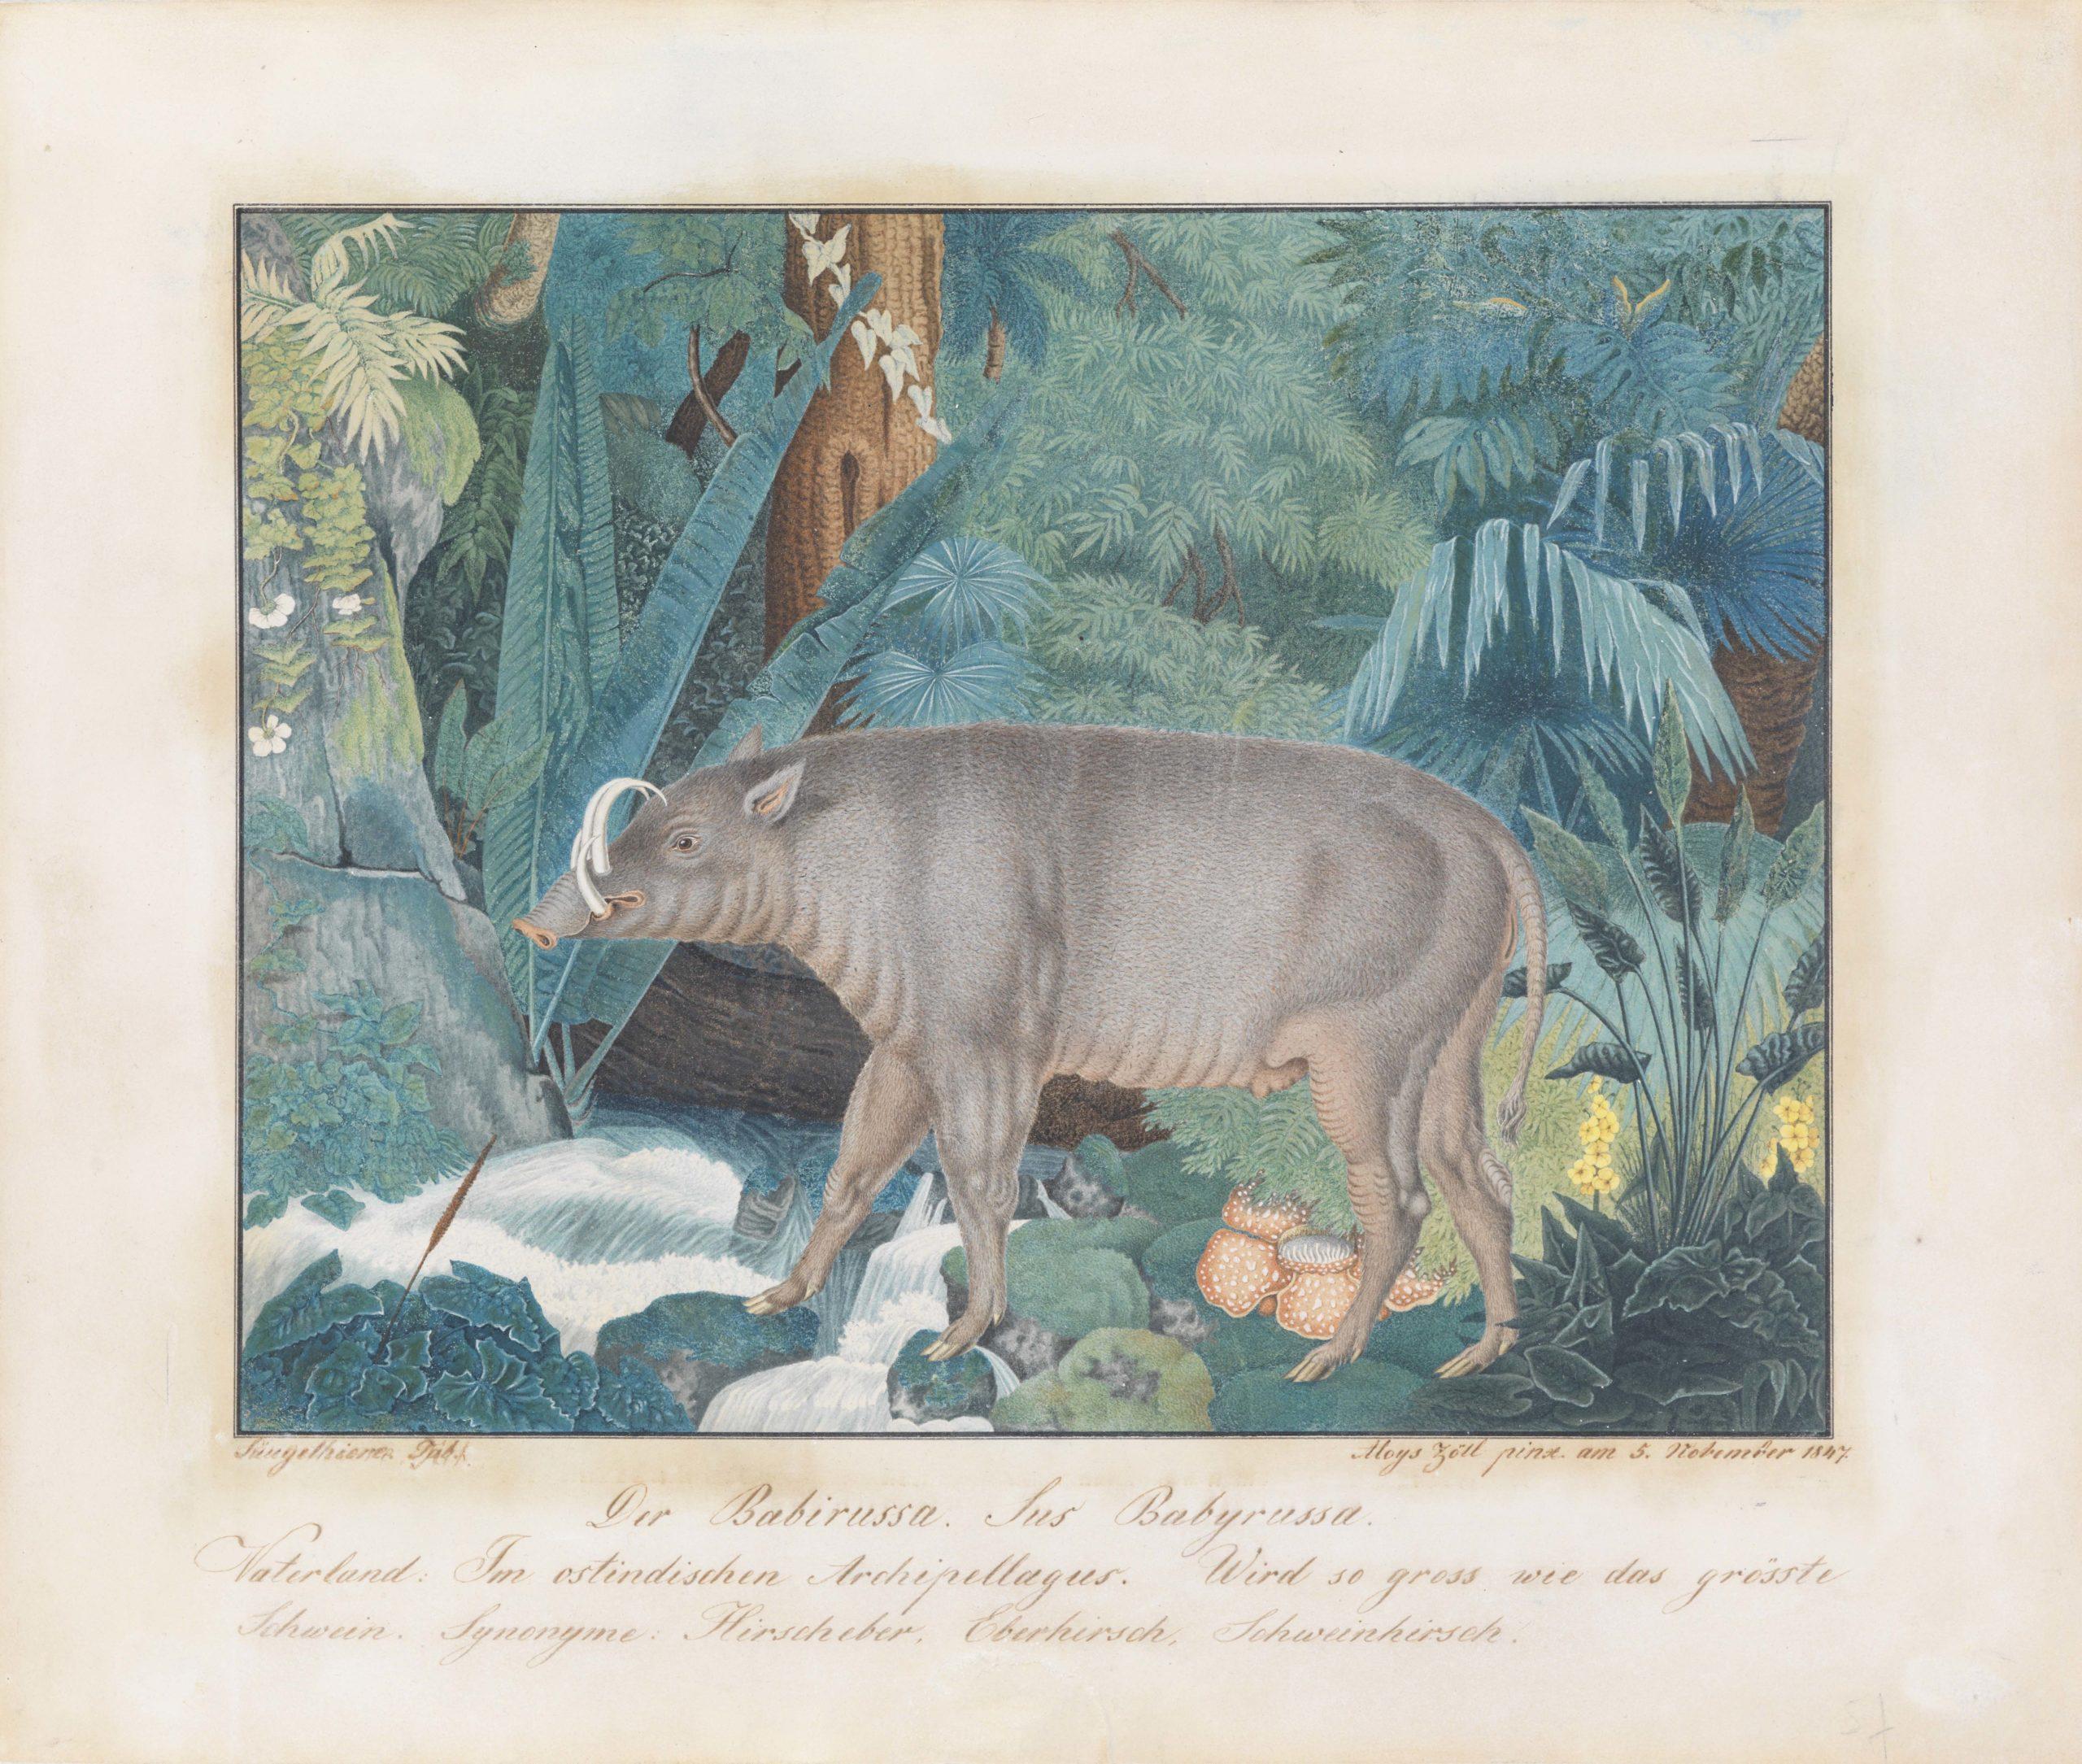 Aloys Zötl, Hirscheber, 1847